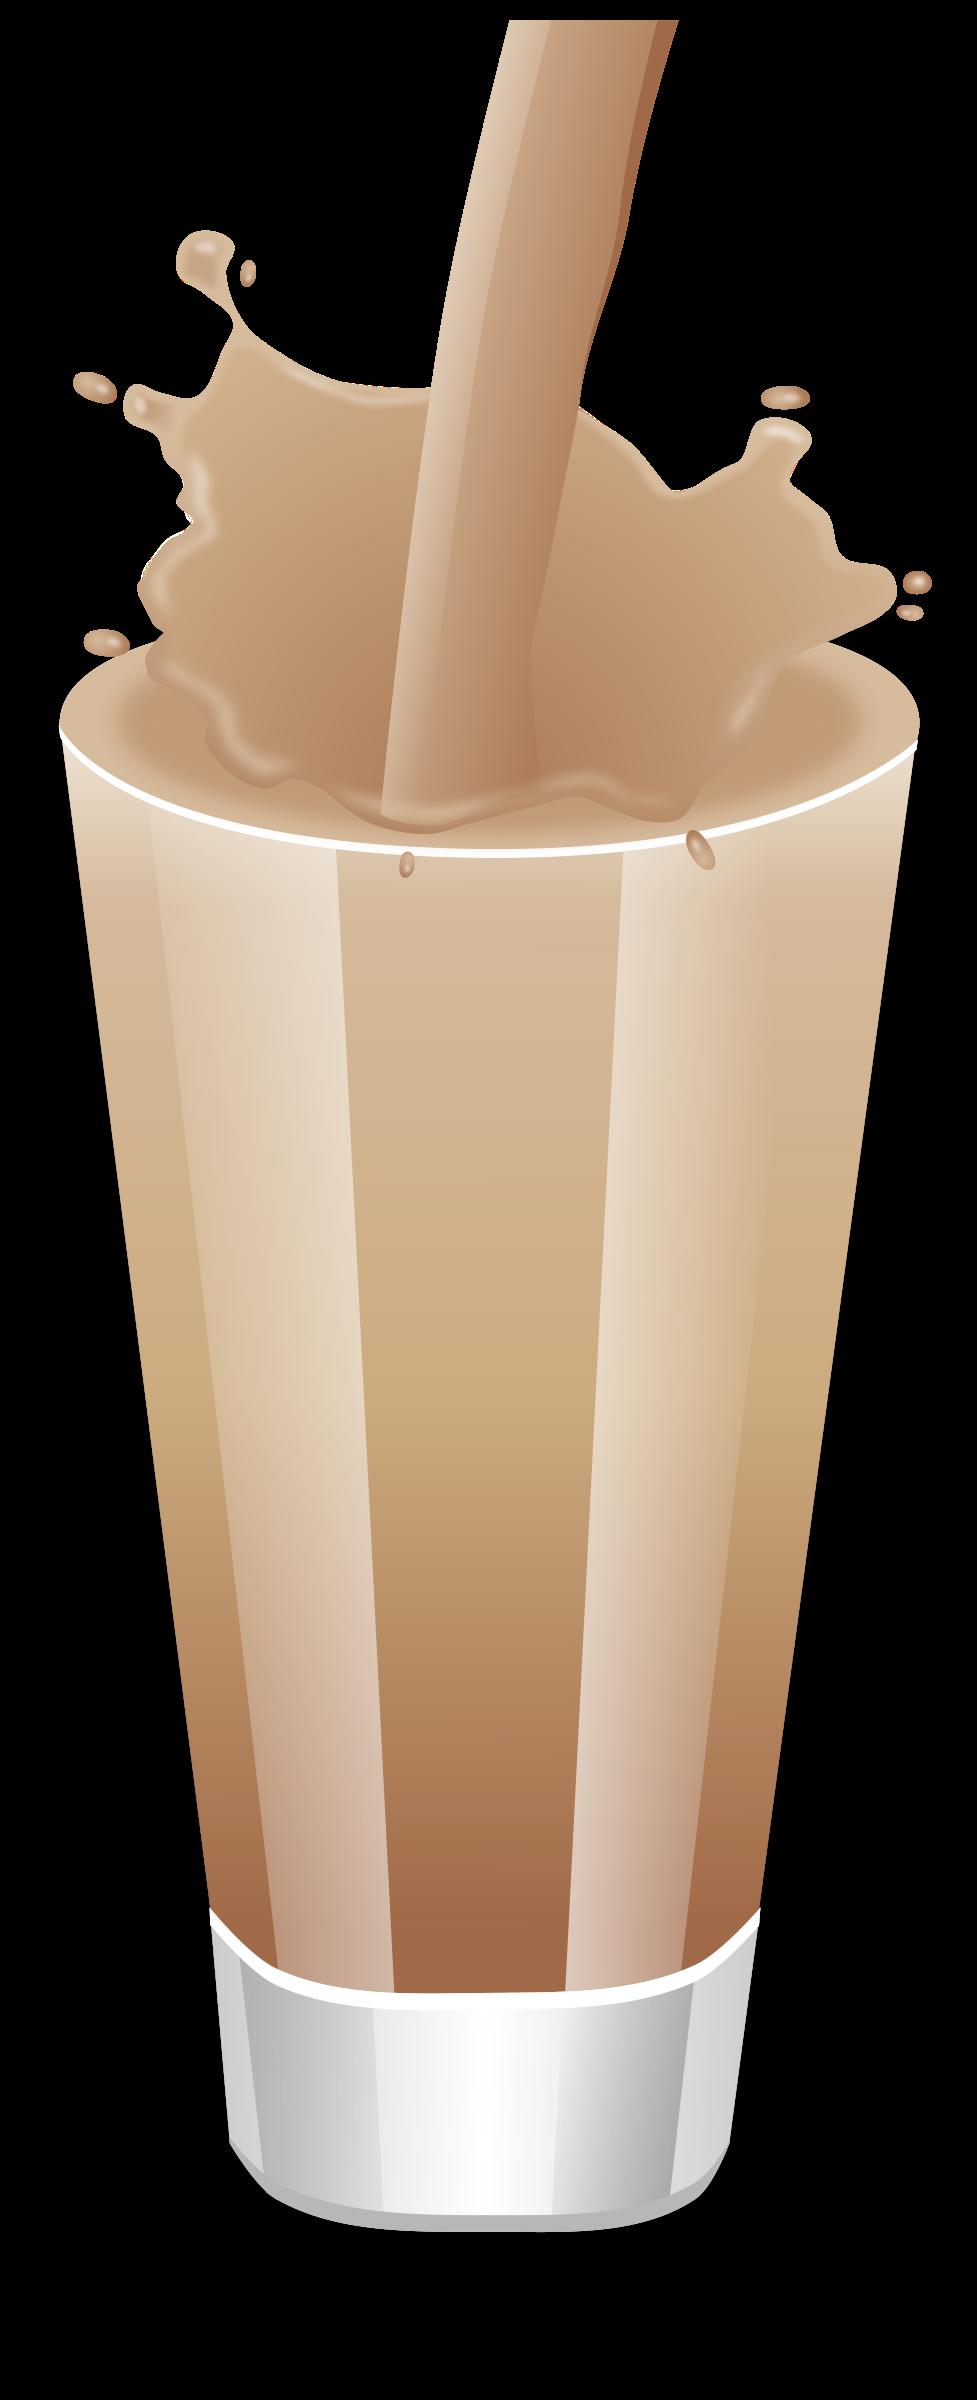 Clipart coffee milkshake. Cocoa big image png